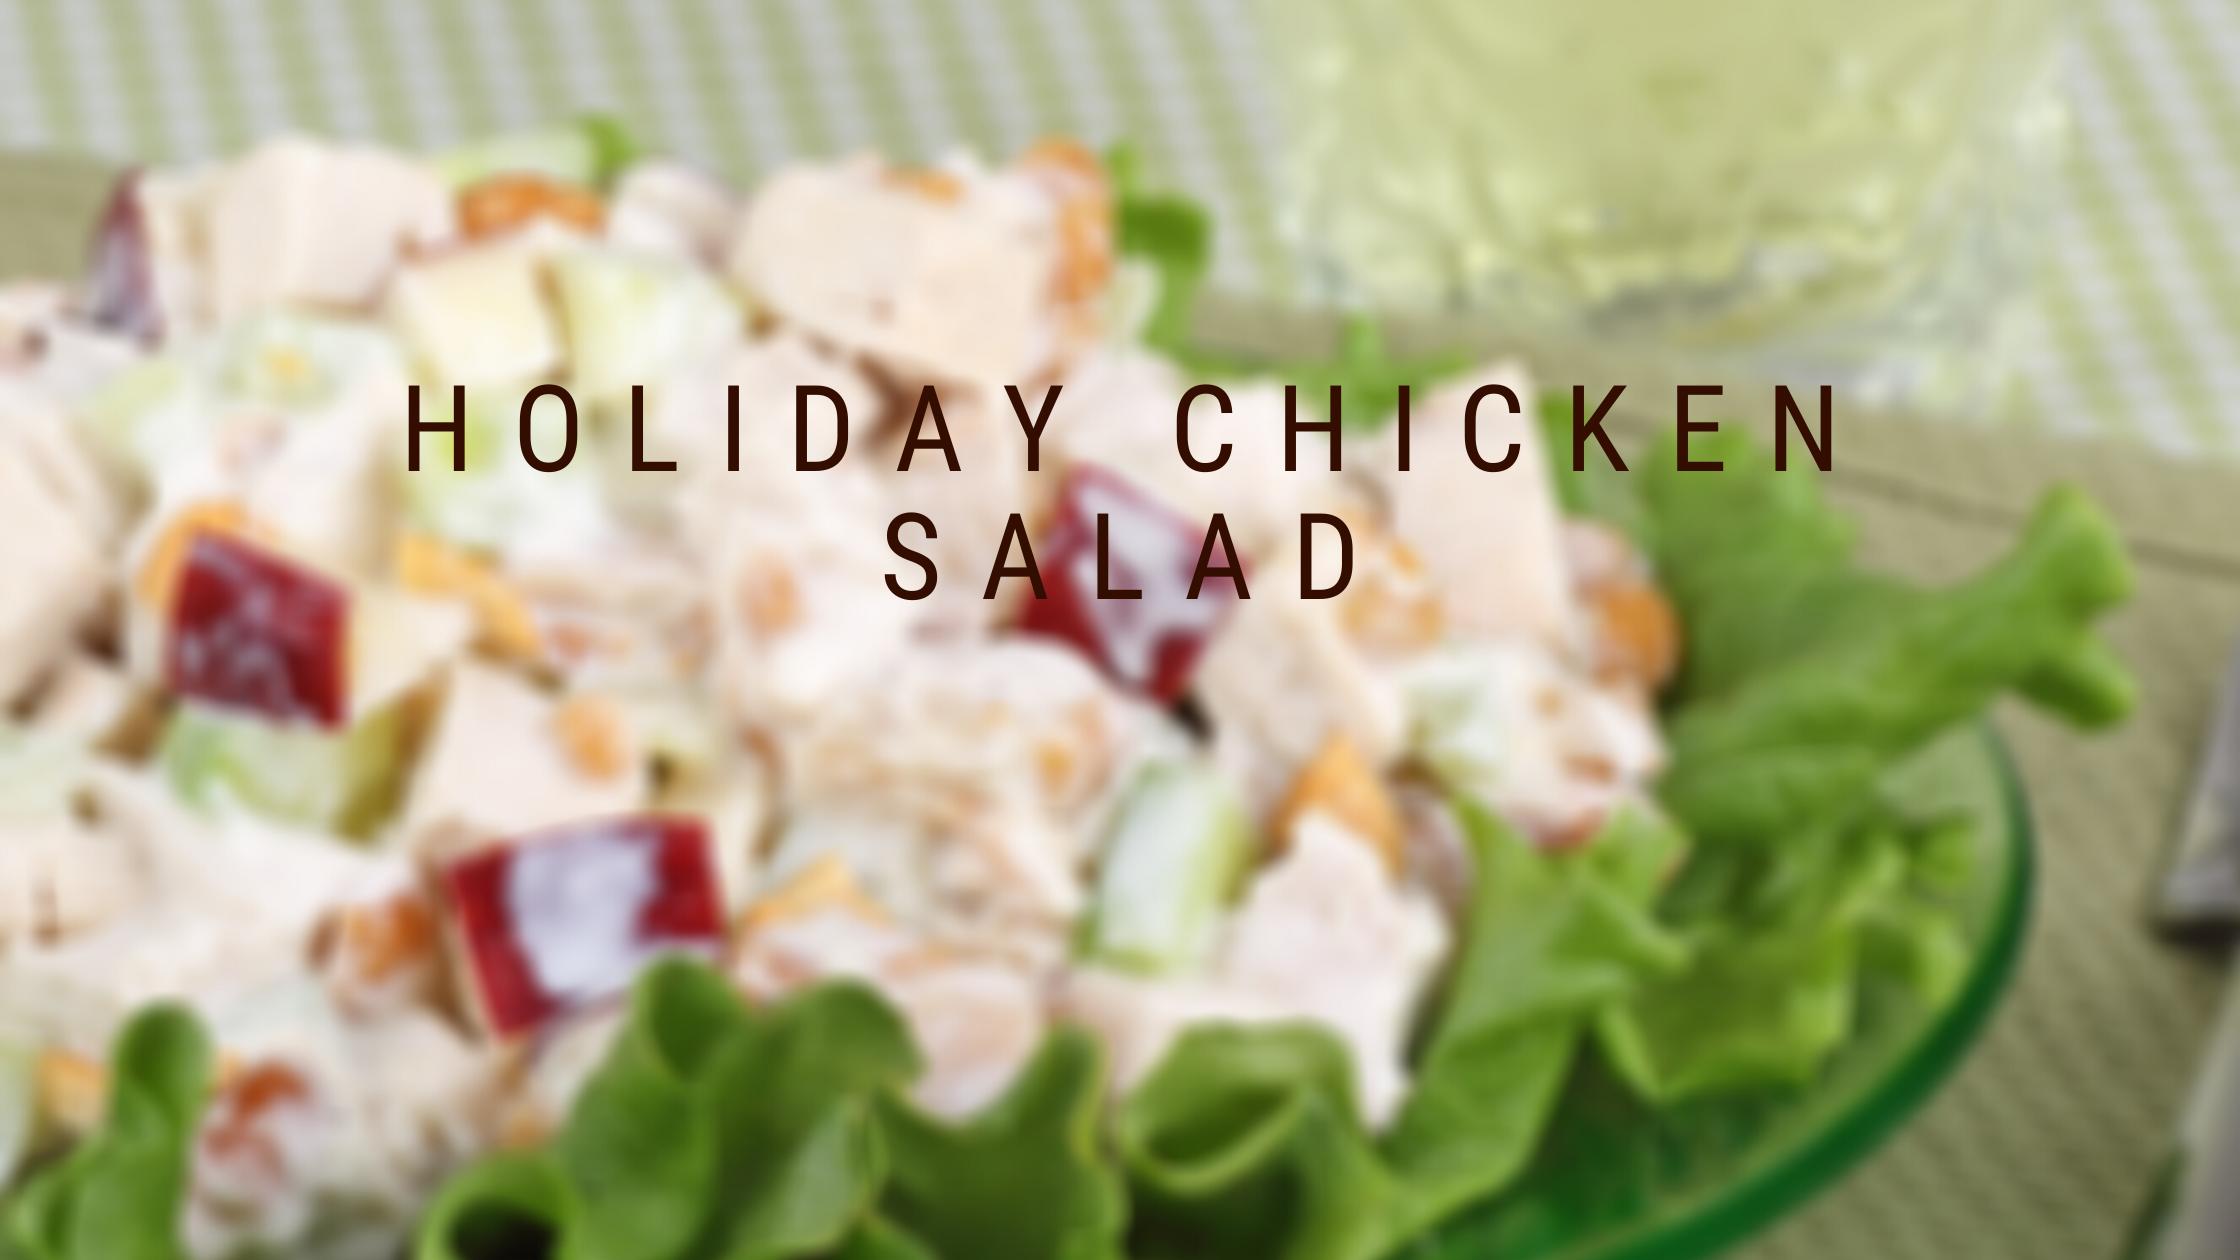 Holiday Chicken Salad Blog Banner.png